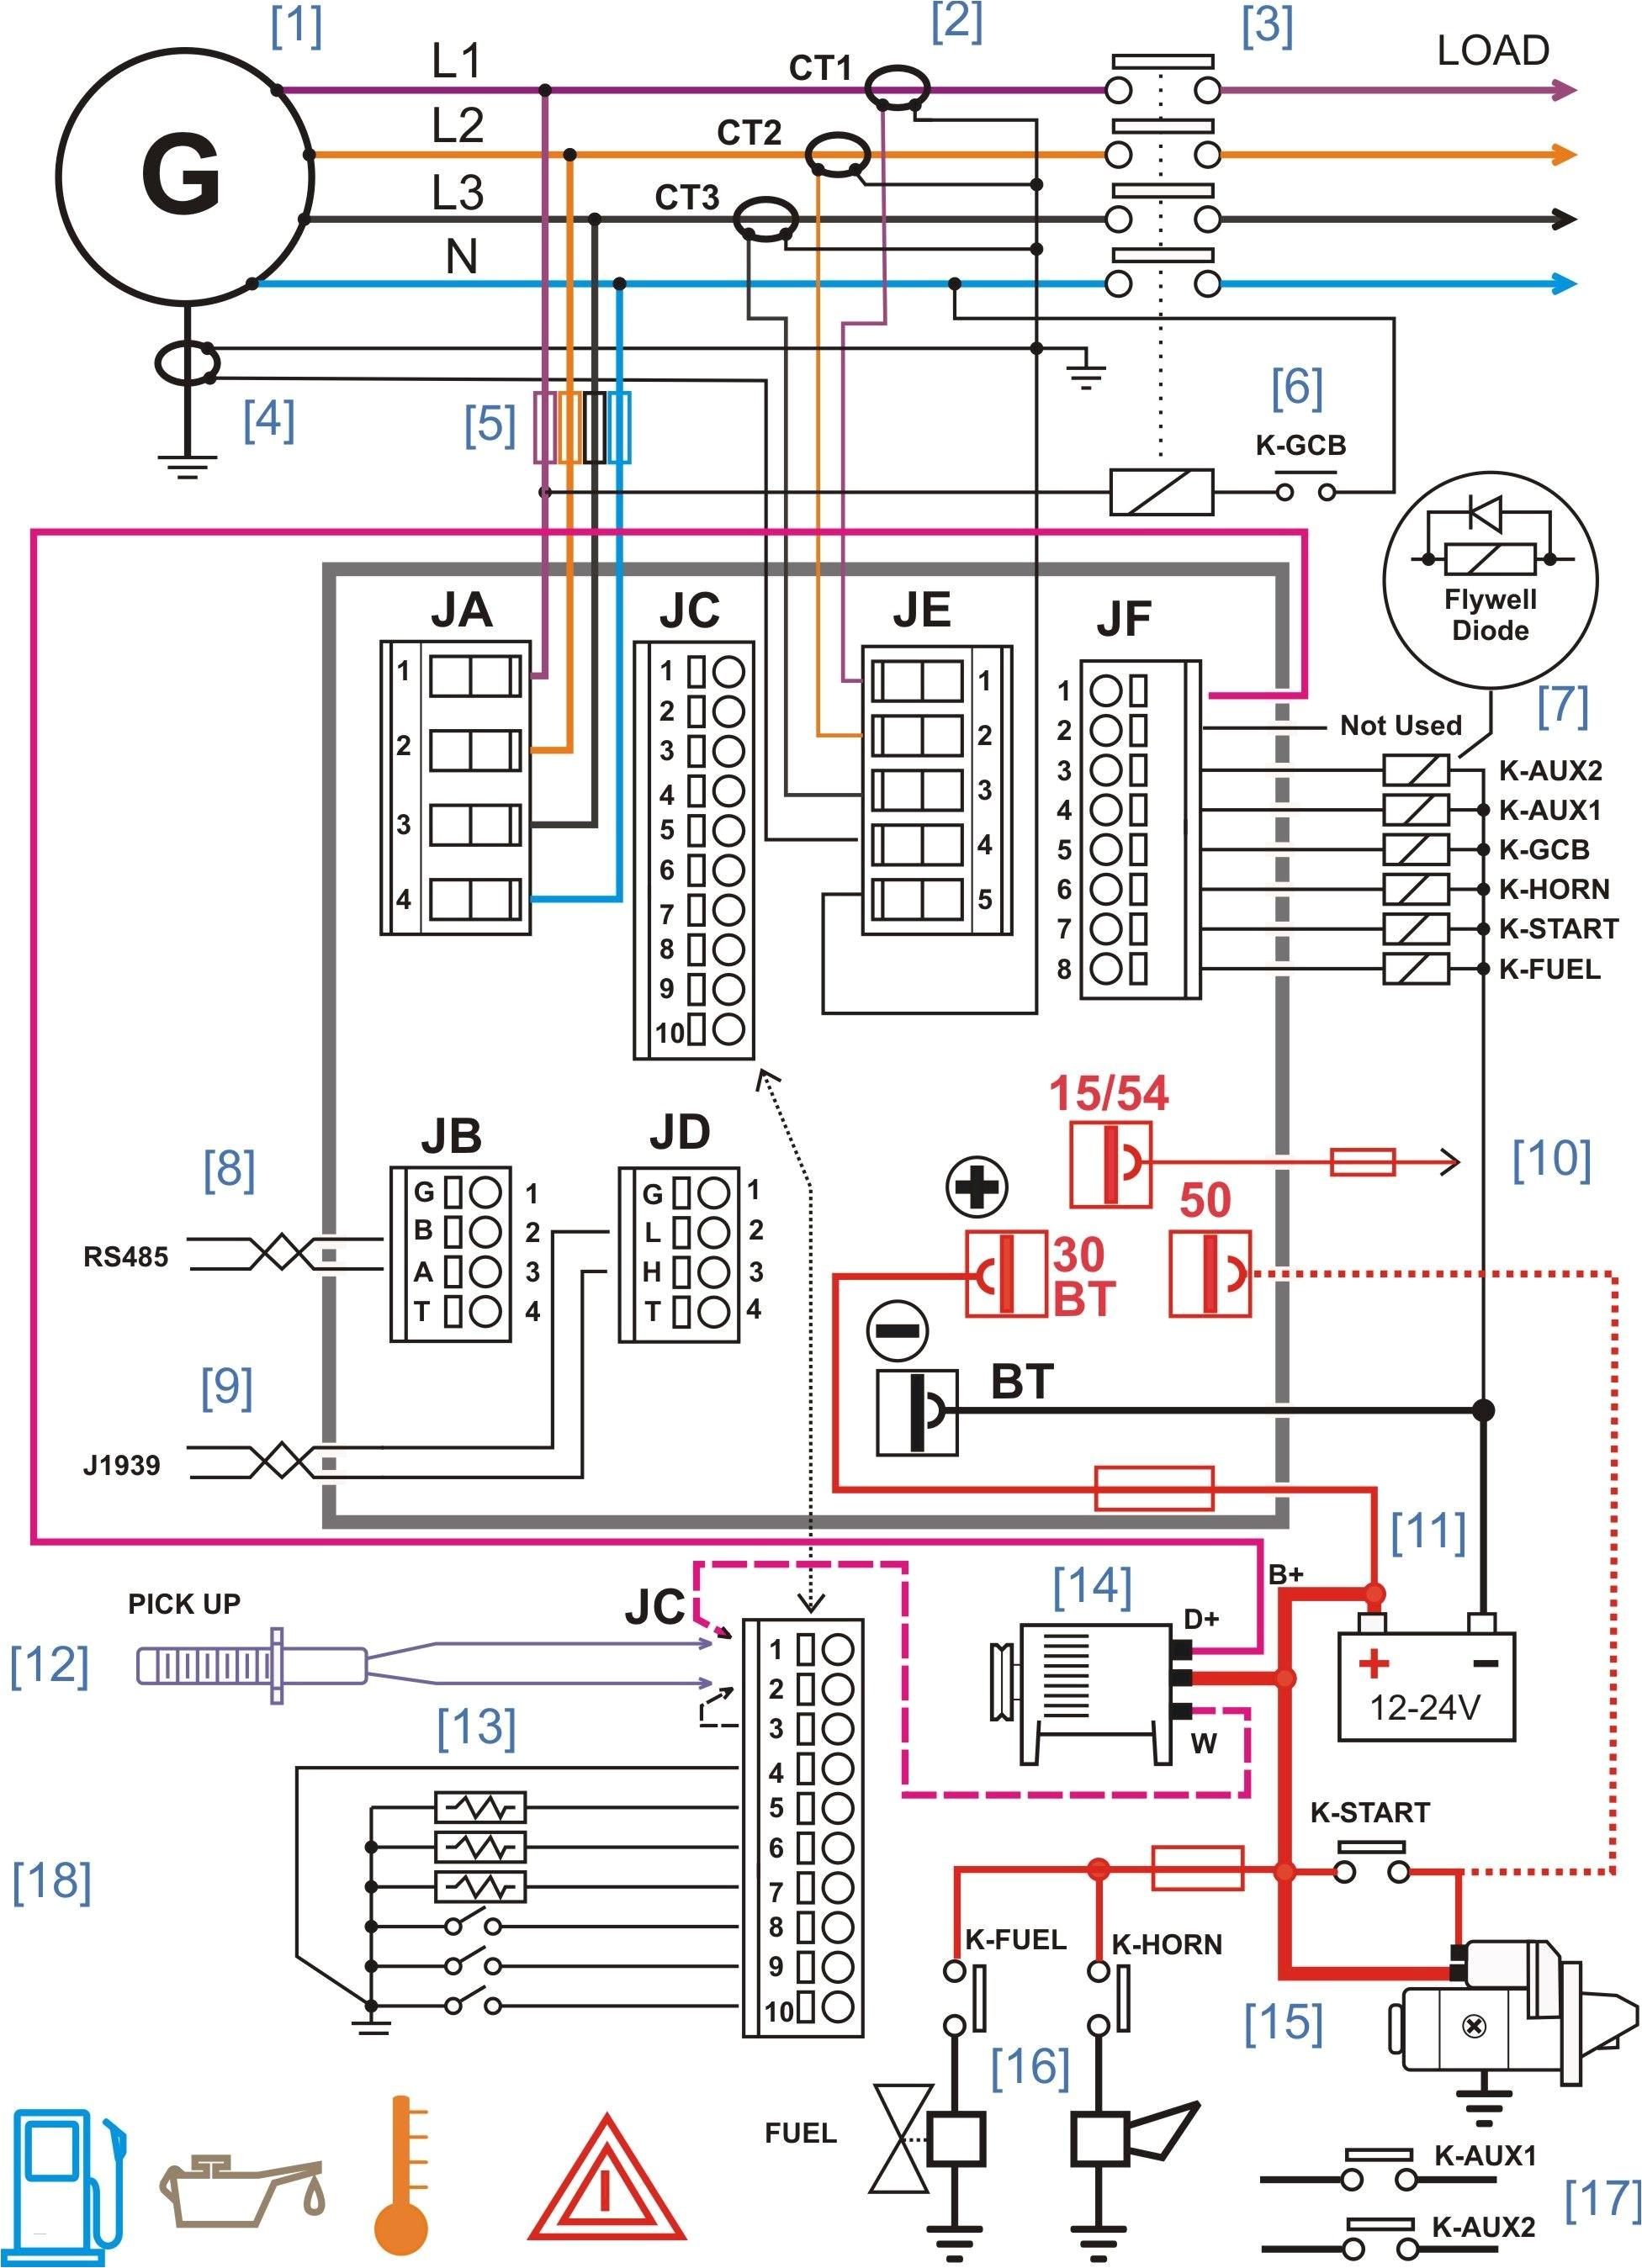 coolant level sensor wiring diagram coolant level sensor diagram rh wiringchartdiagram com